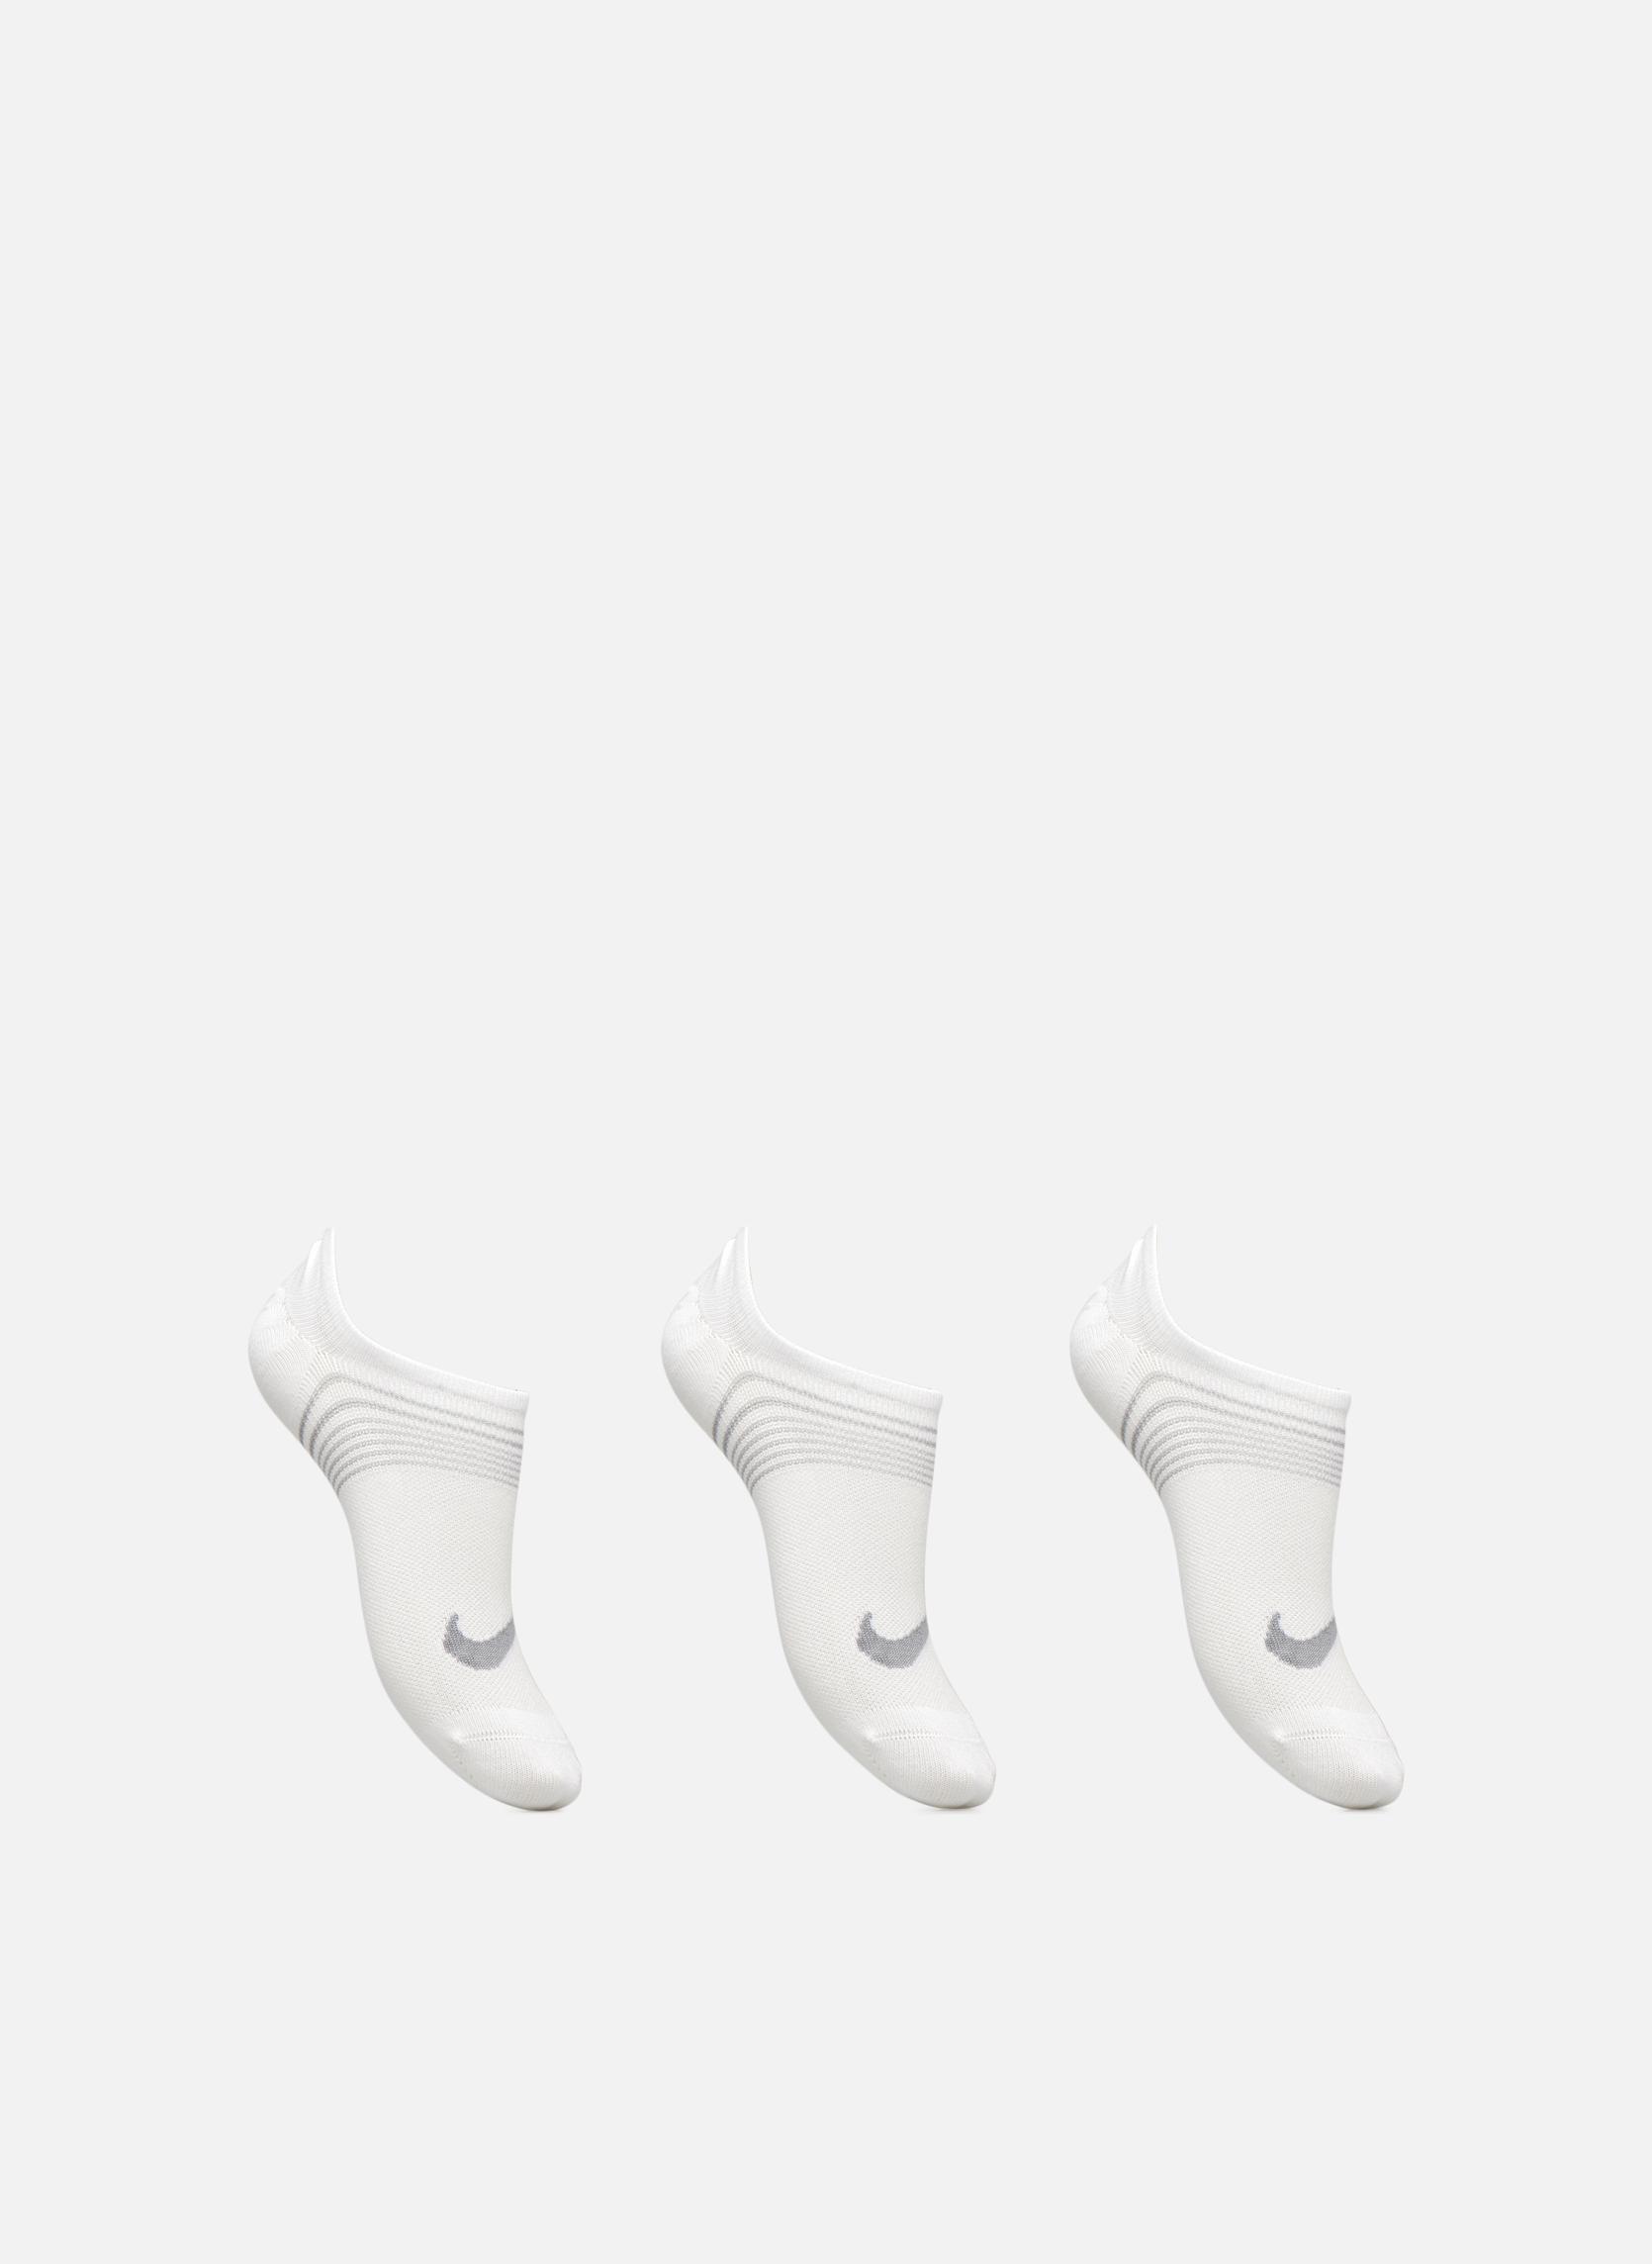 Medias y Calcetines Accesorios Women's Nike Performance Lightweight Training Footie 3PR